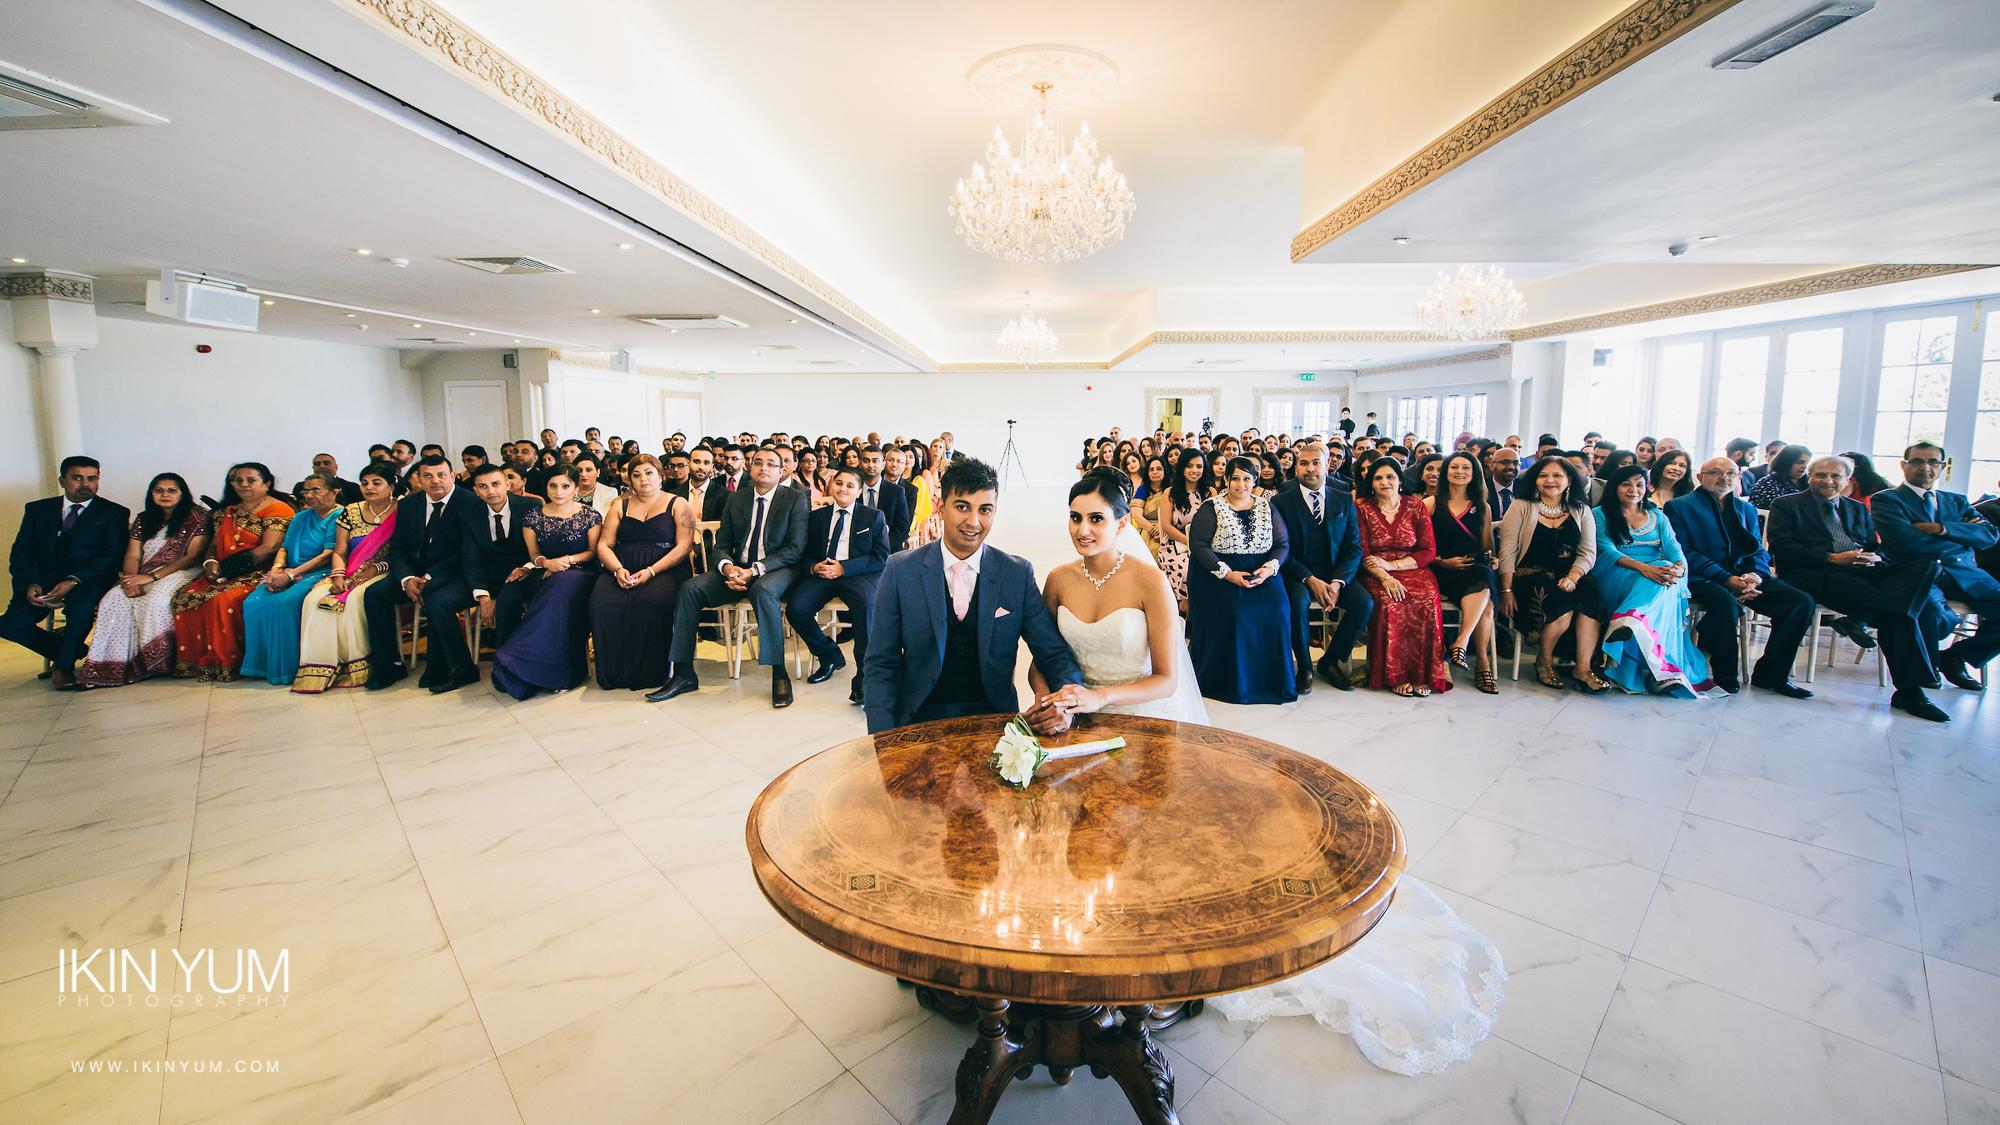 Froyle Park Indian Wedding - Ikin Yum Photography-070.jpg